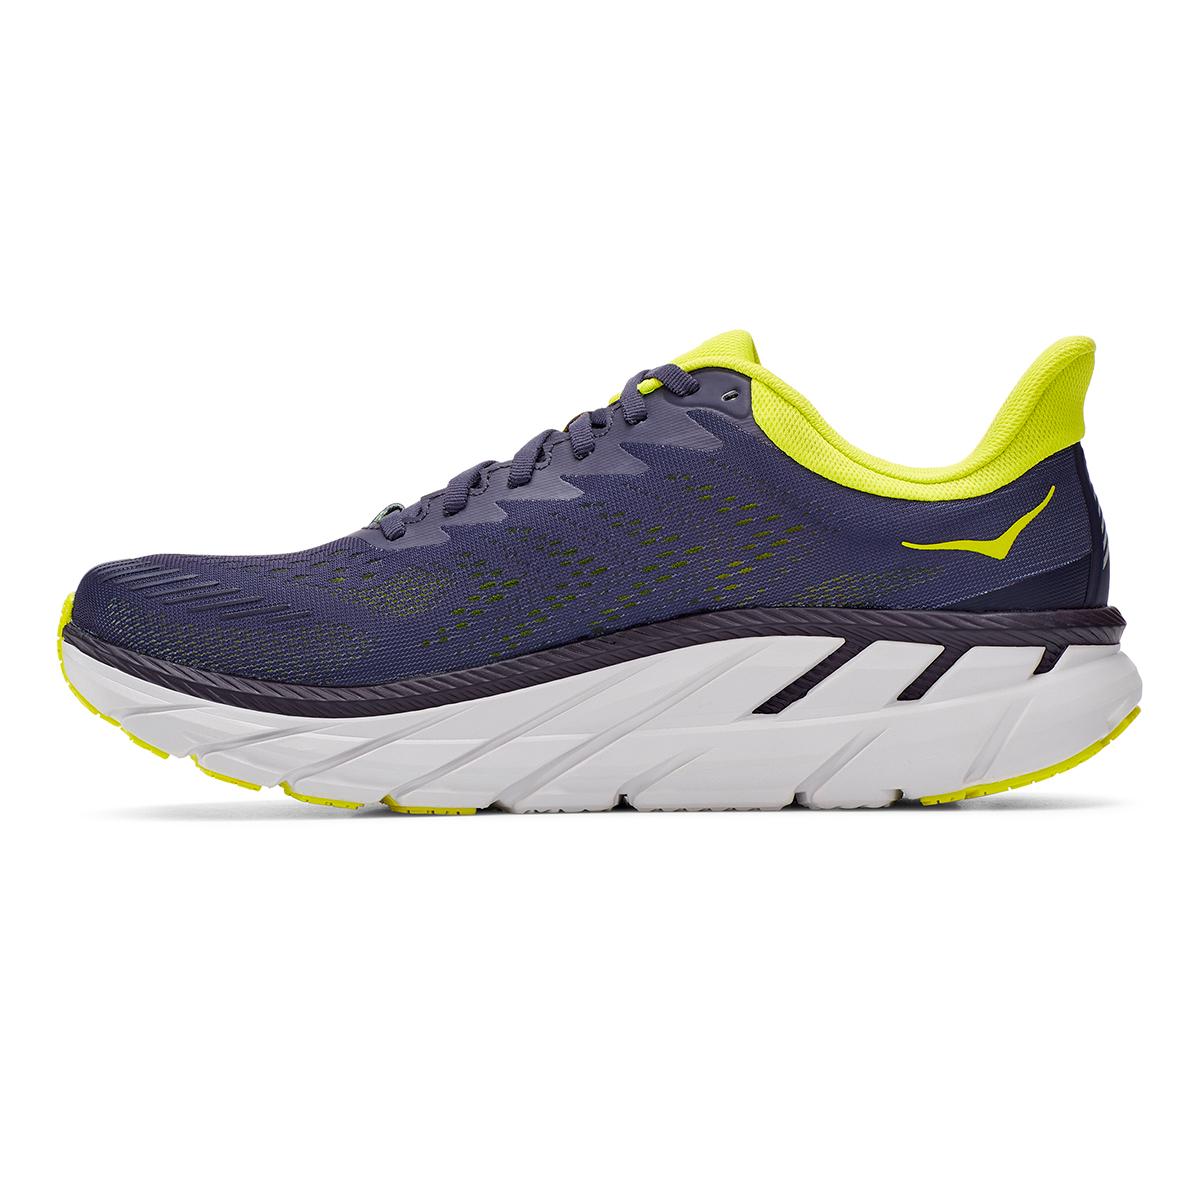 Men's Hoka One One Clifton 7 Running Shoe - Color: Odyssey Grey/Evening Primrose - Size: 7 - Width: Regular, Odyssey Grey/Evening Primrose, large, image 6